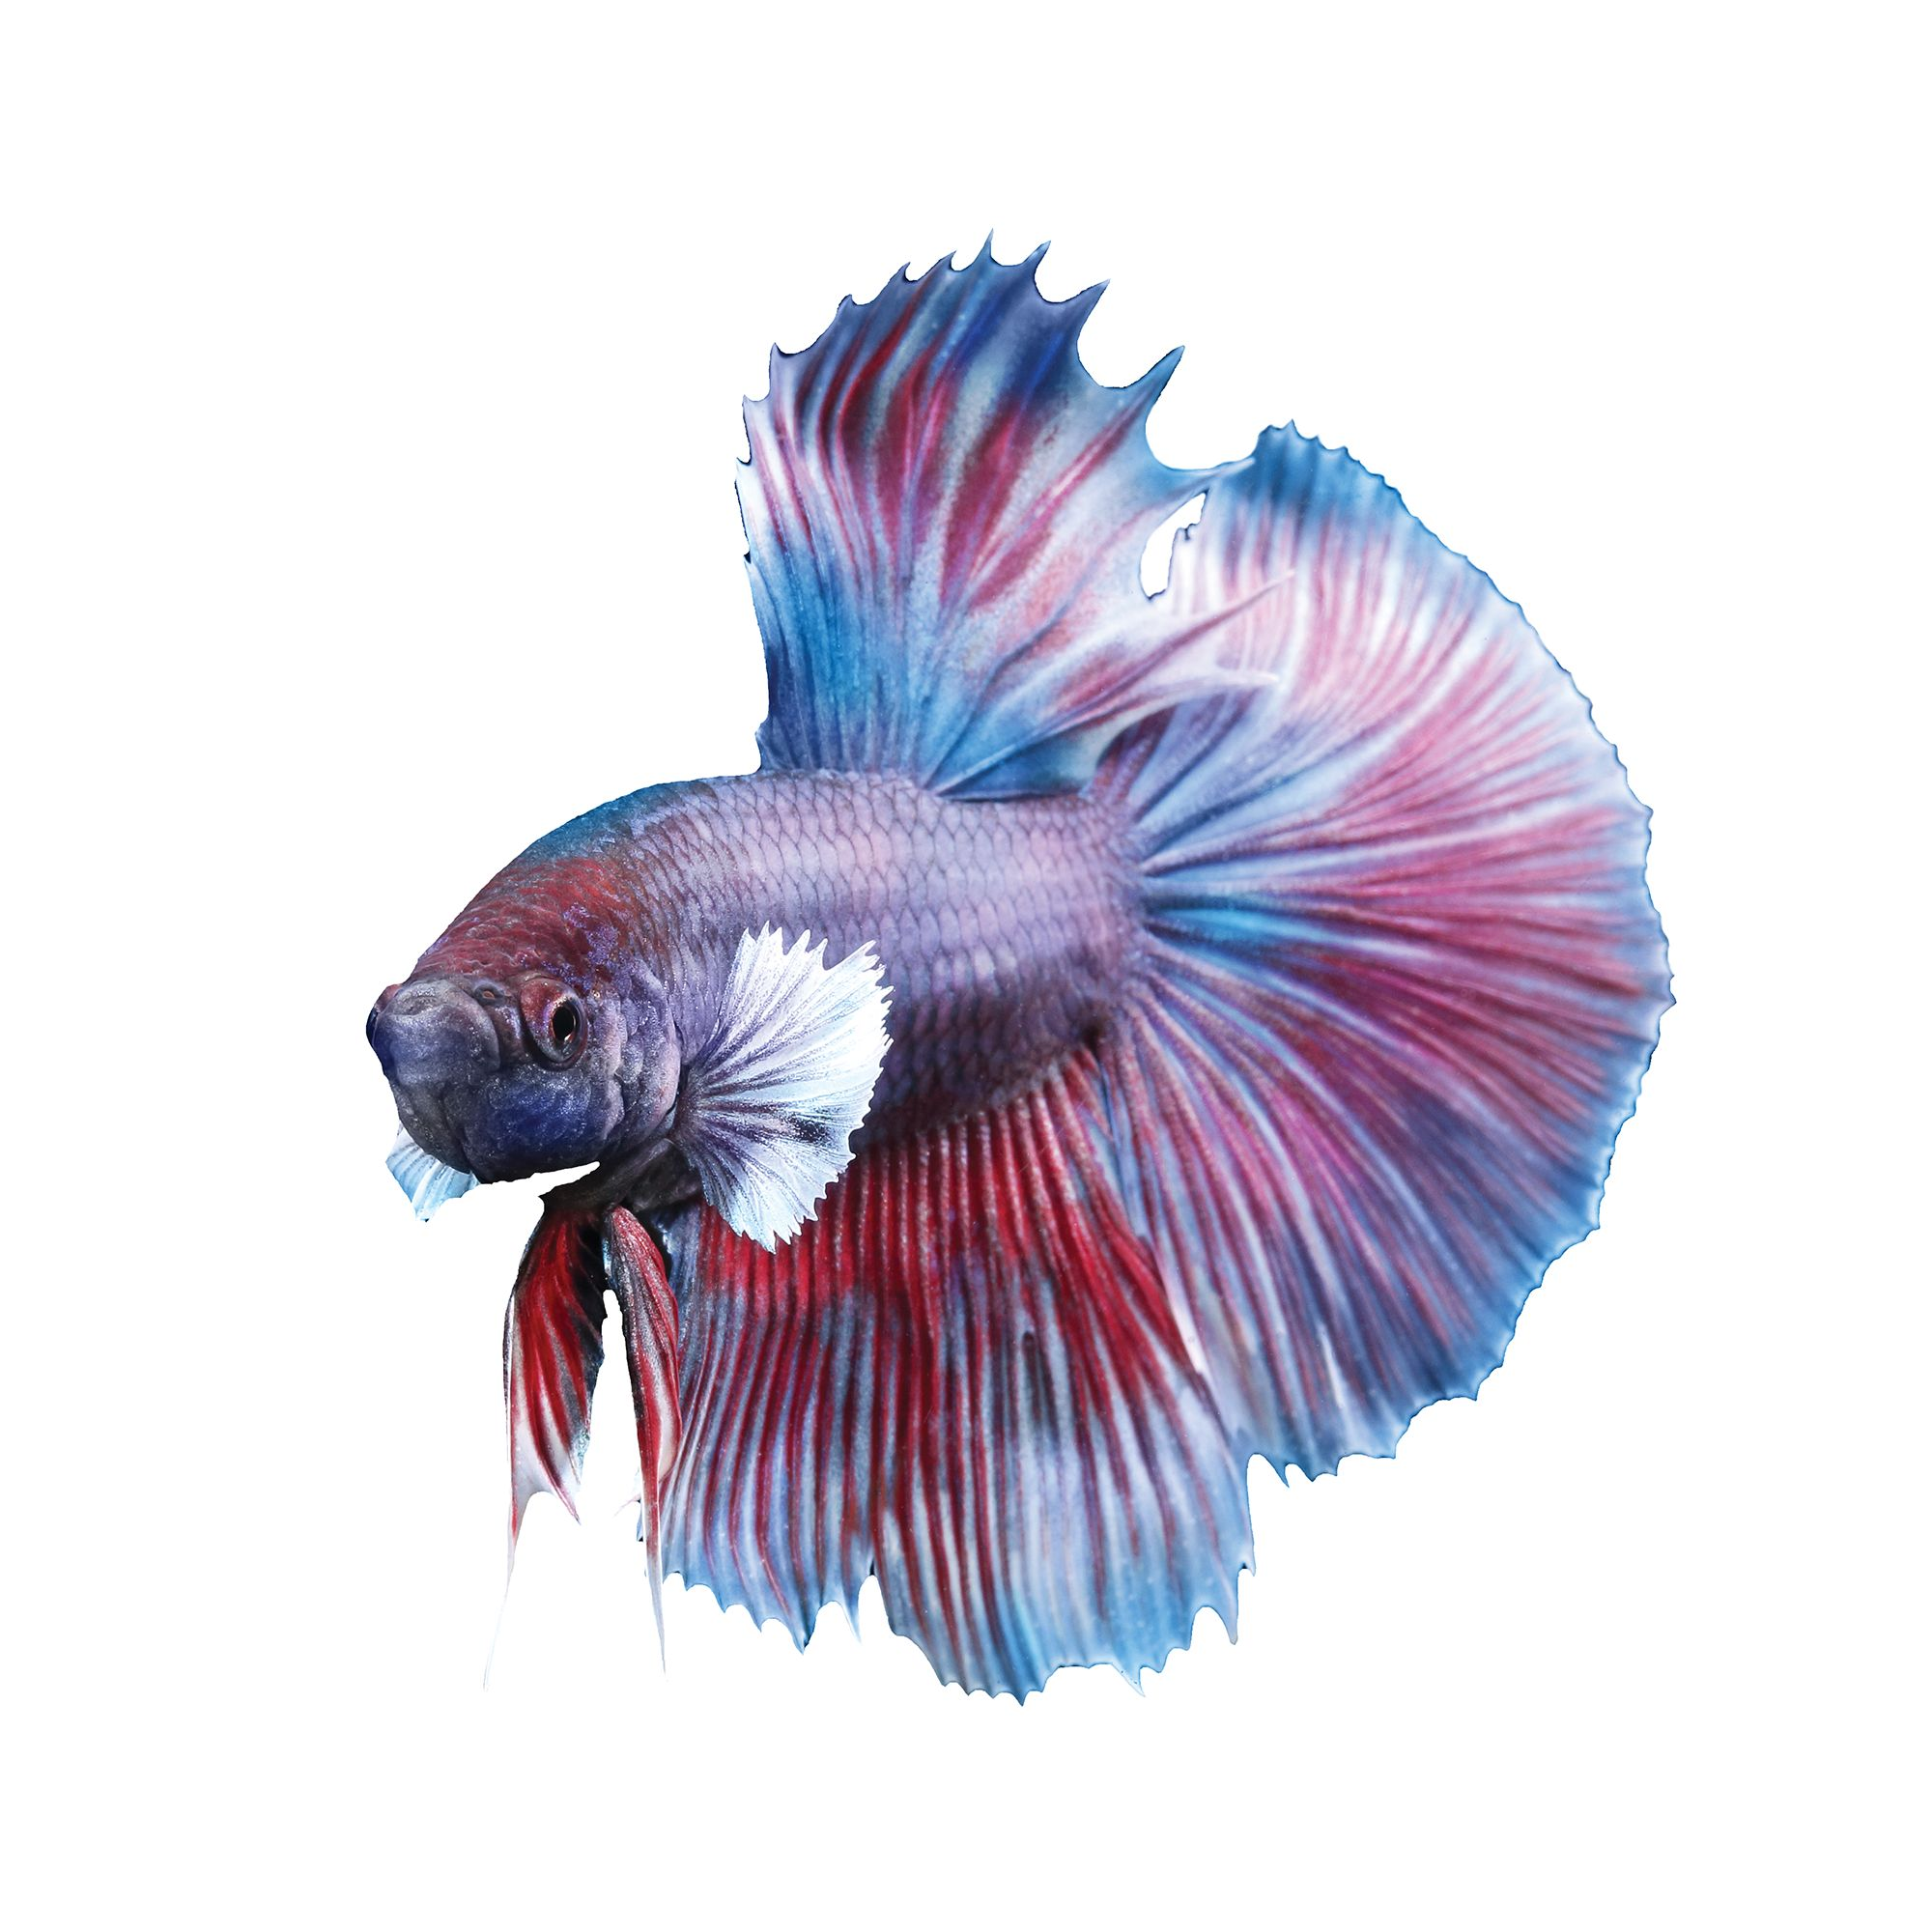 Dumbo Halfmoon Betta Fish For Sale Live Pet Fish Petsmart